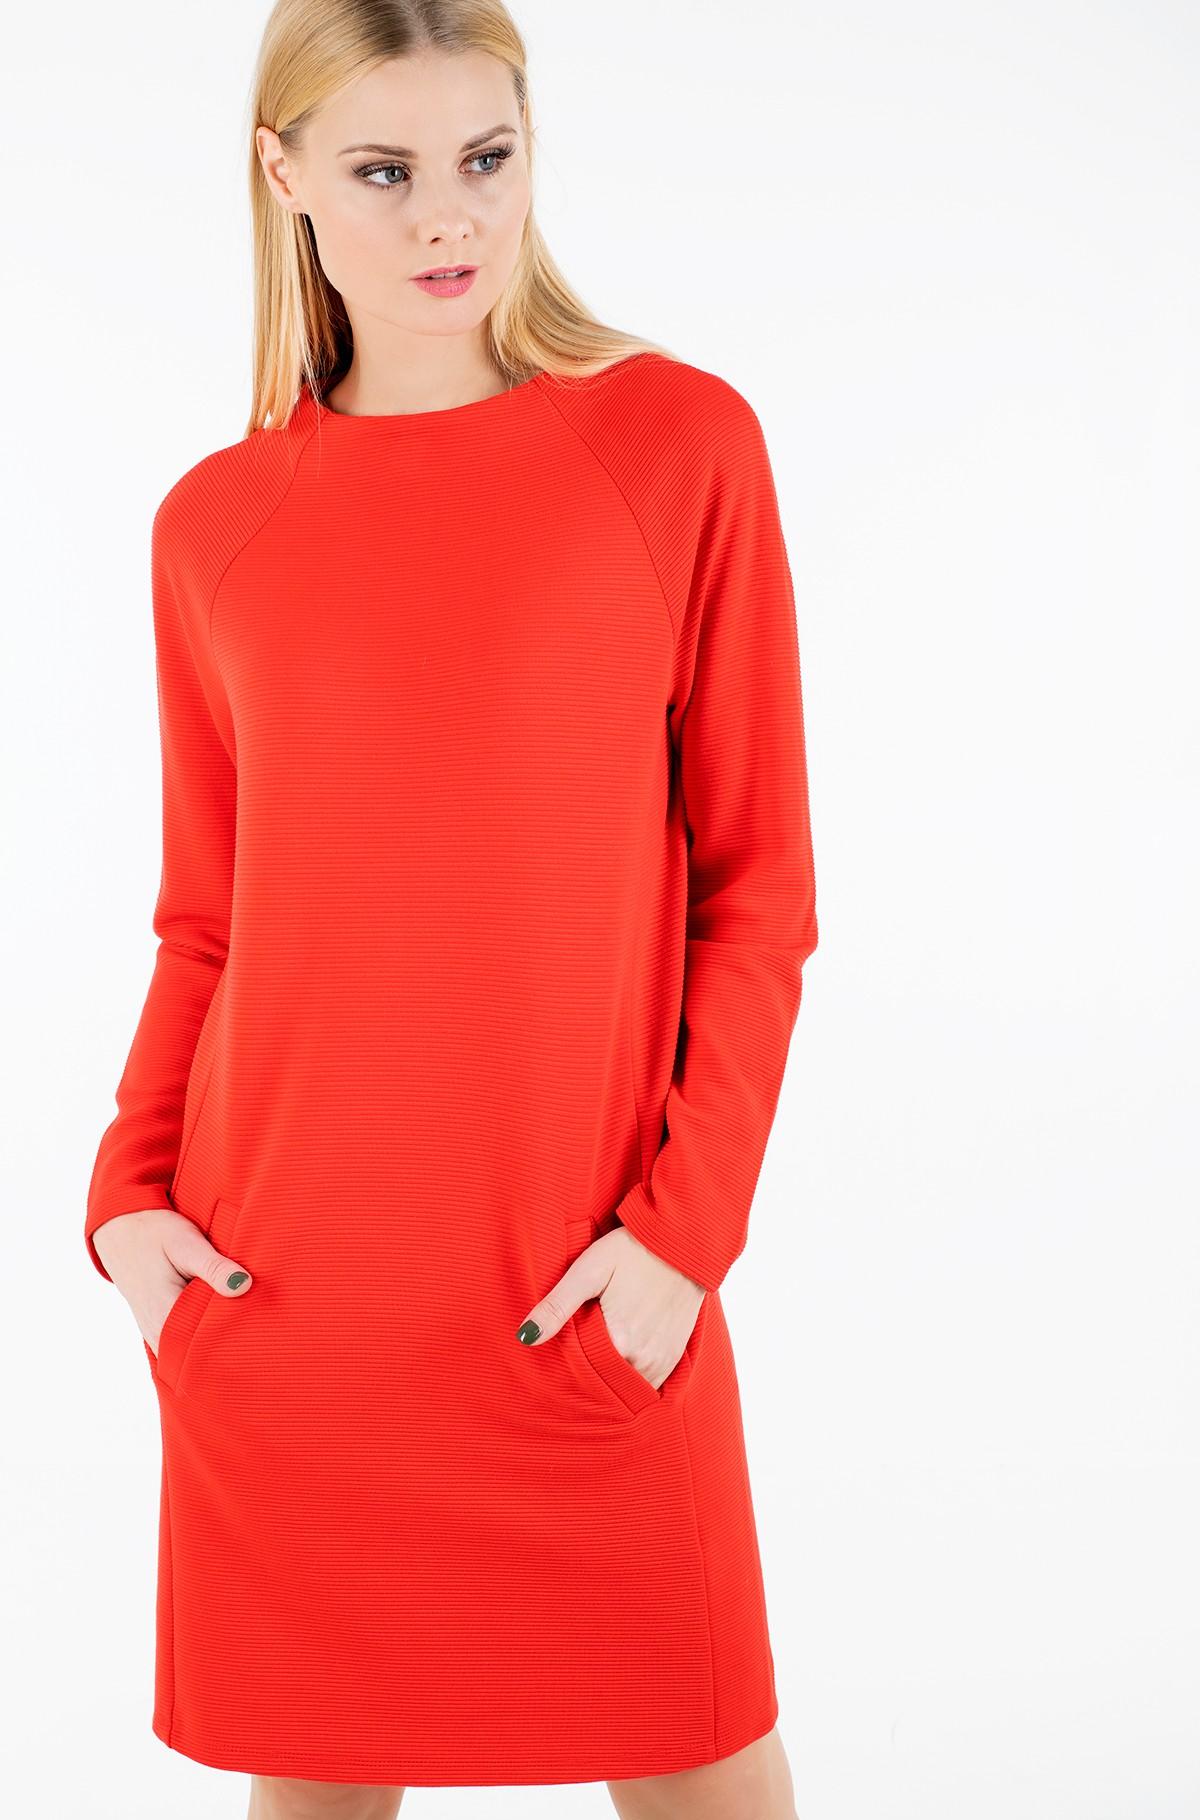 Suknelė 1022143-full-1